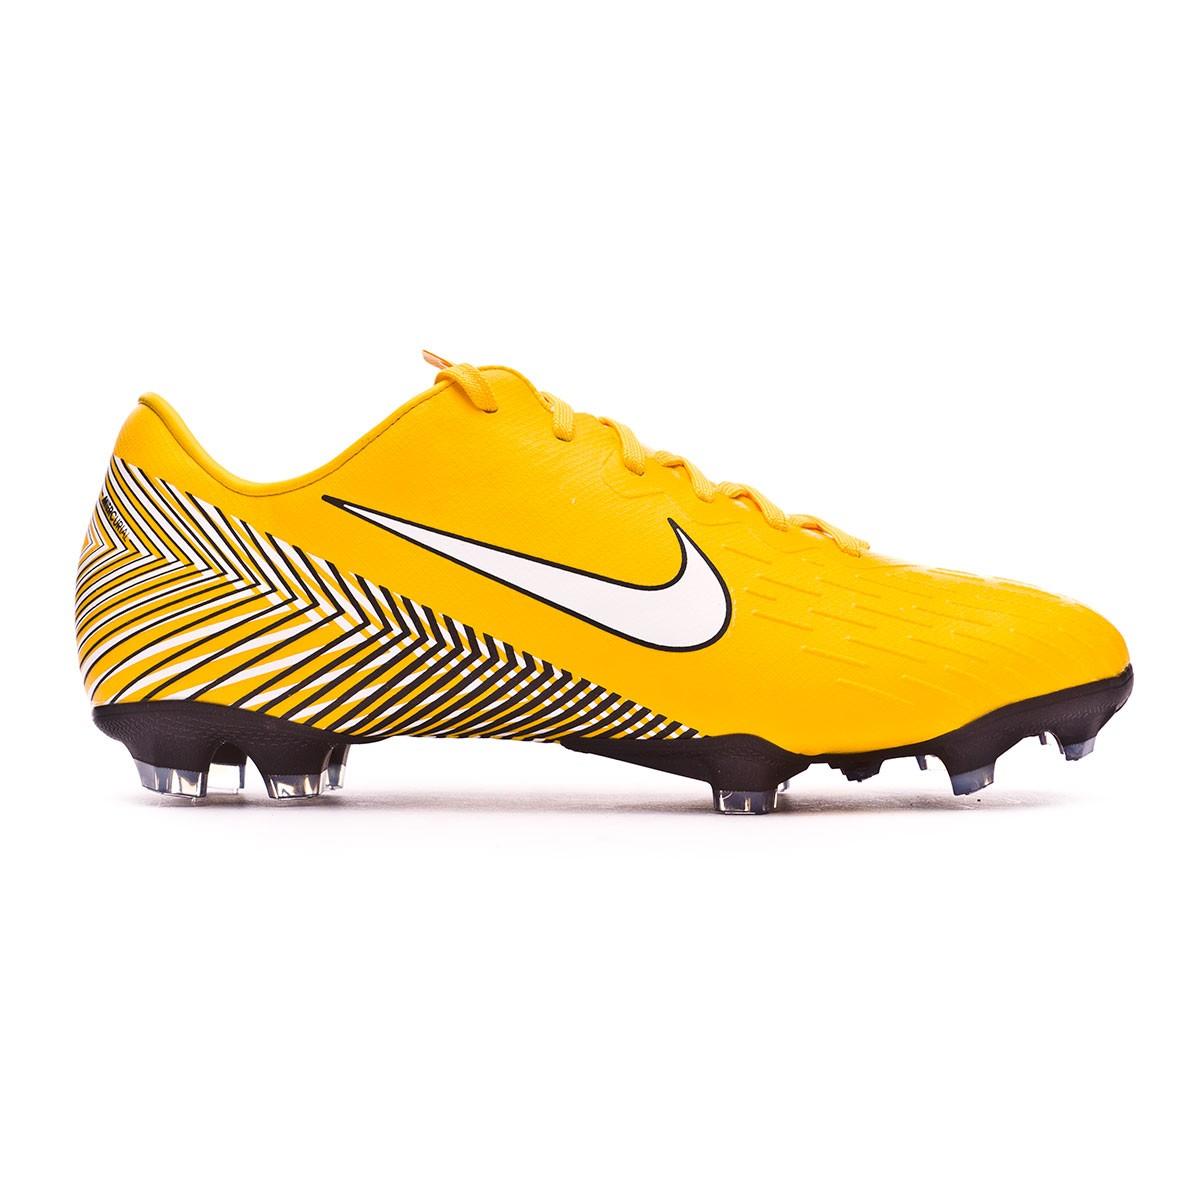 6106170ca5a5c Football Boots Nike Kids Mercurial Vapor XII Elite FG Neymar  Yellow-Black-Anthracite - Tienda de fútbol Fútbol Emotion